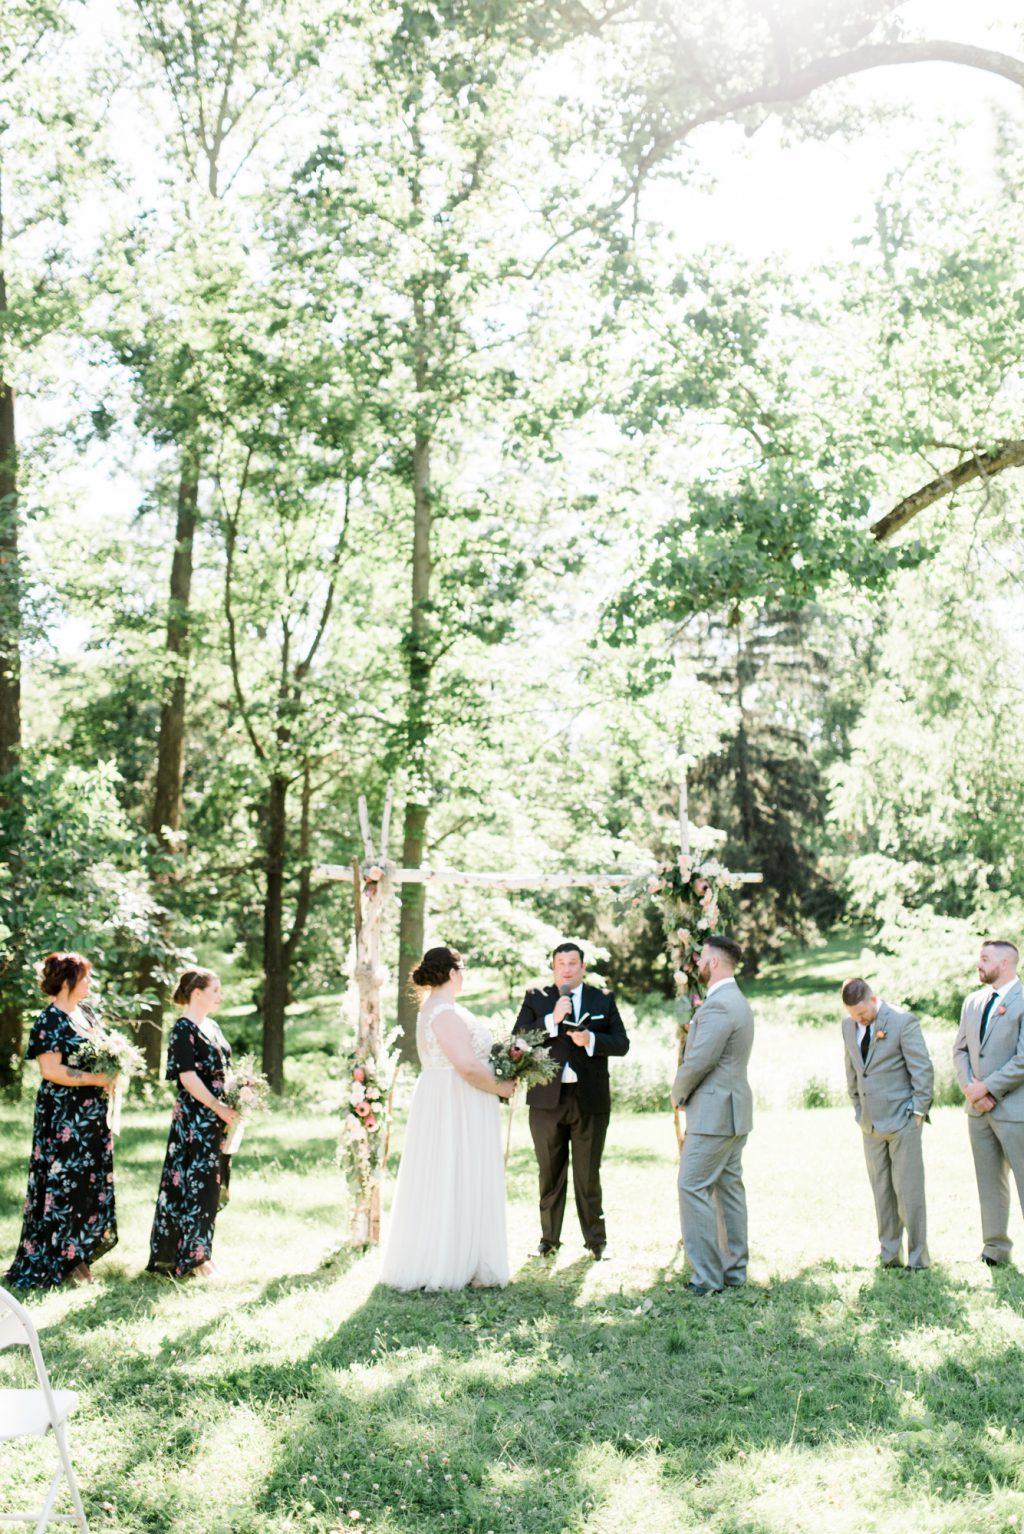 haley-richter-photo-west-chester-summer-wedding-boxcar-brewery-124